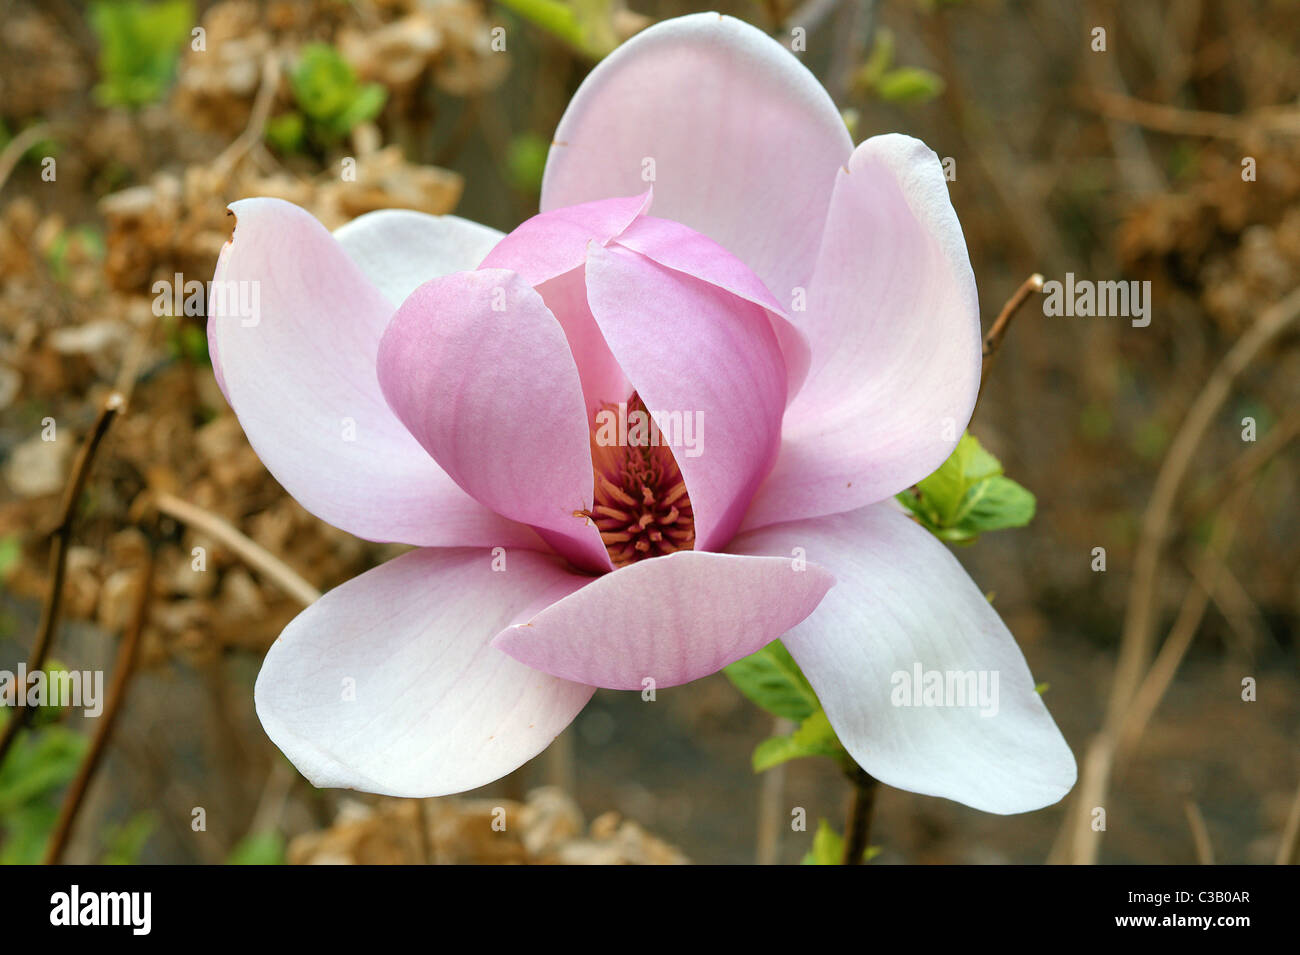 Magnolia grandiflora pink big spring stock photos magnolia magnolia grandiflora pink big spring flower close up stock image mightylinksfo